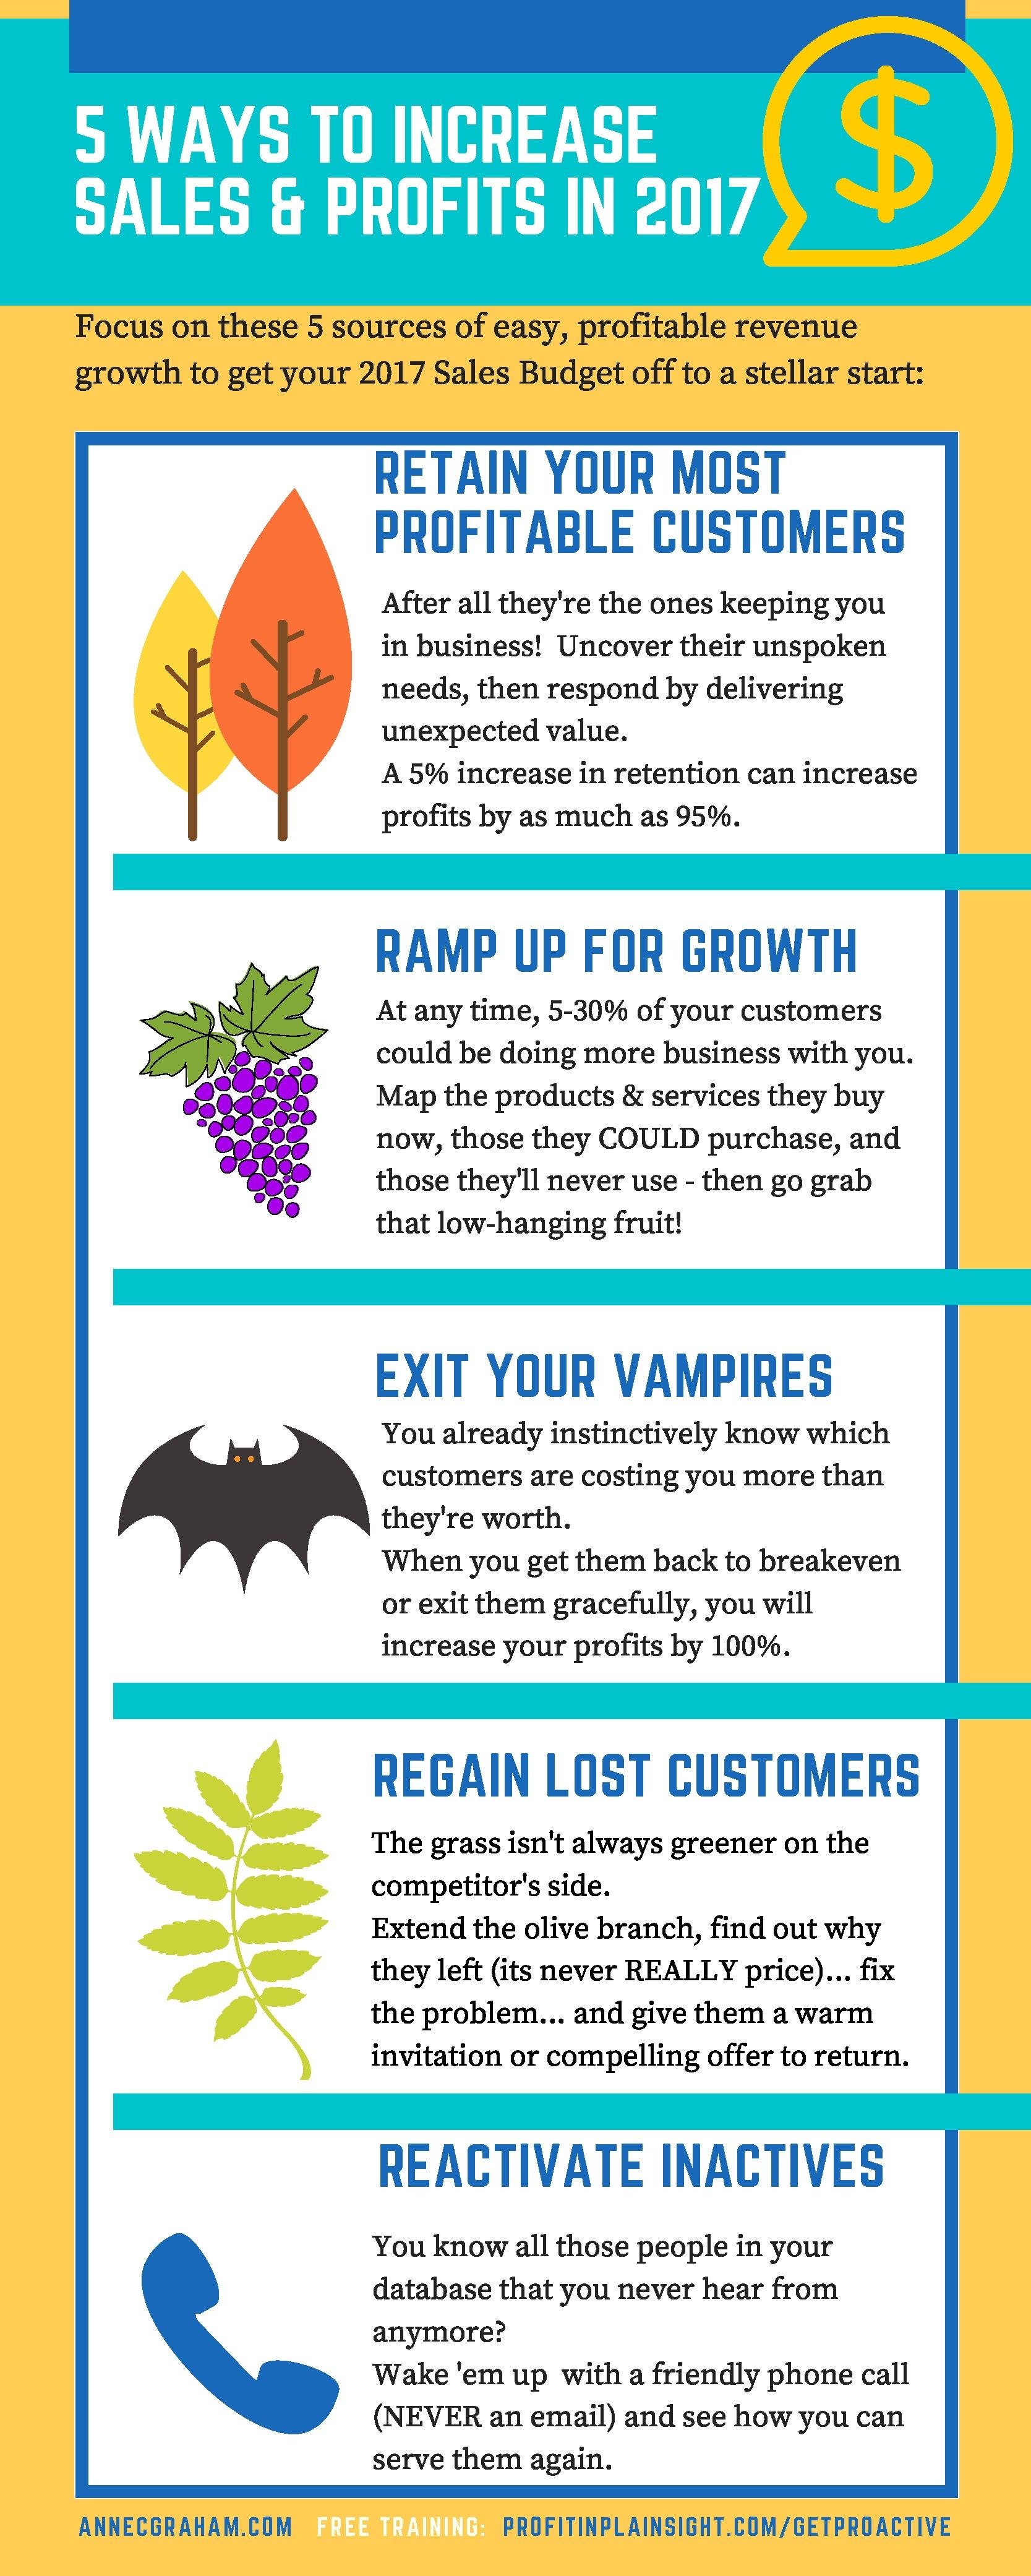 5 Ways to Increase Sales and Profit in 2017.jpg